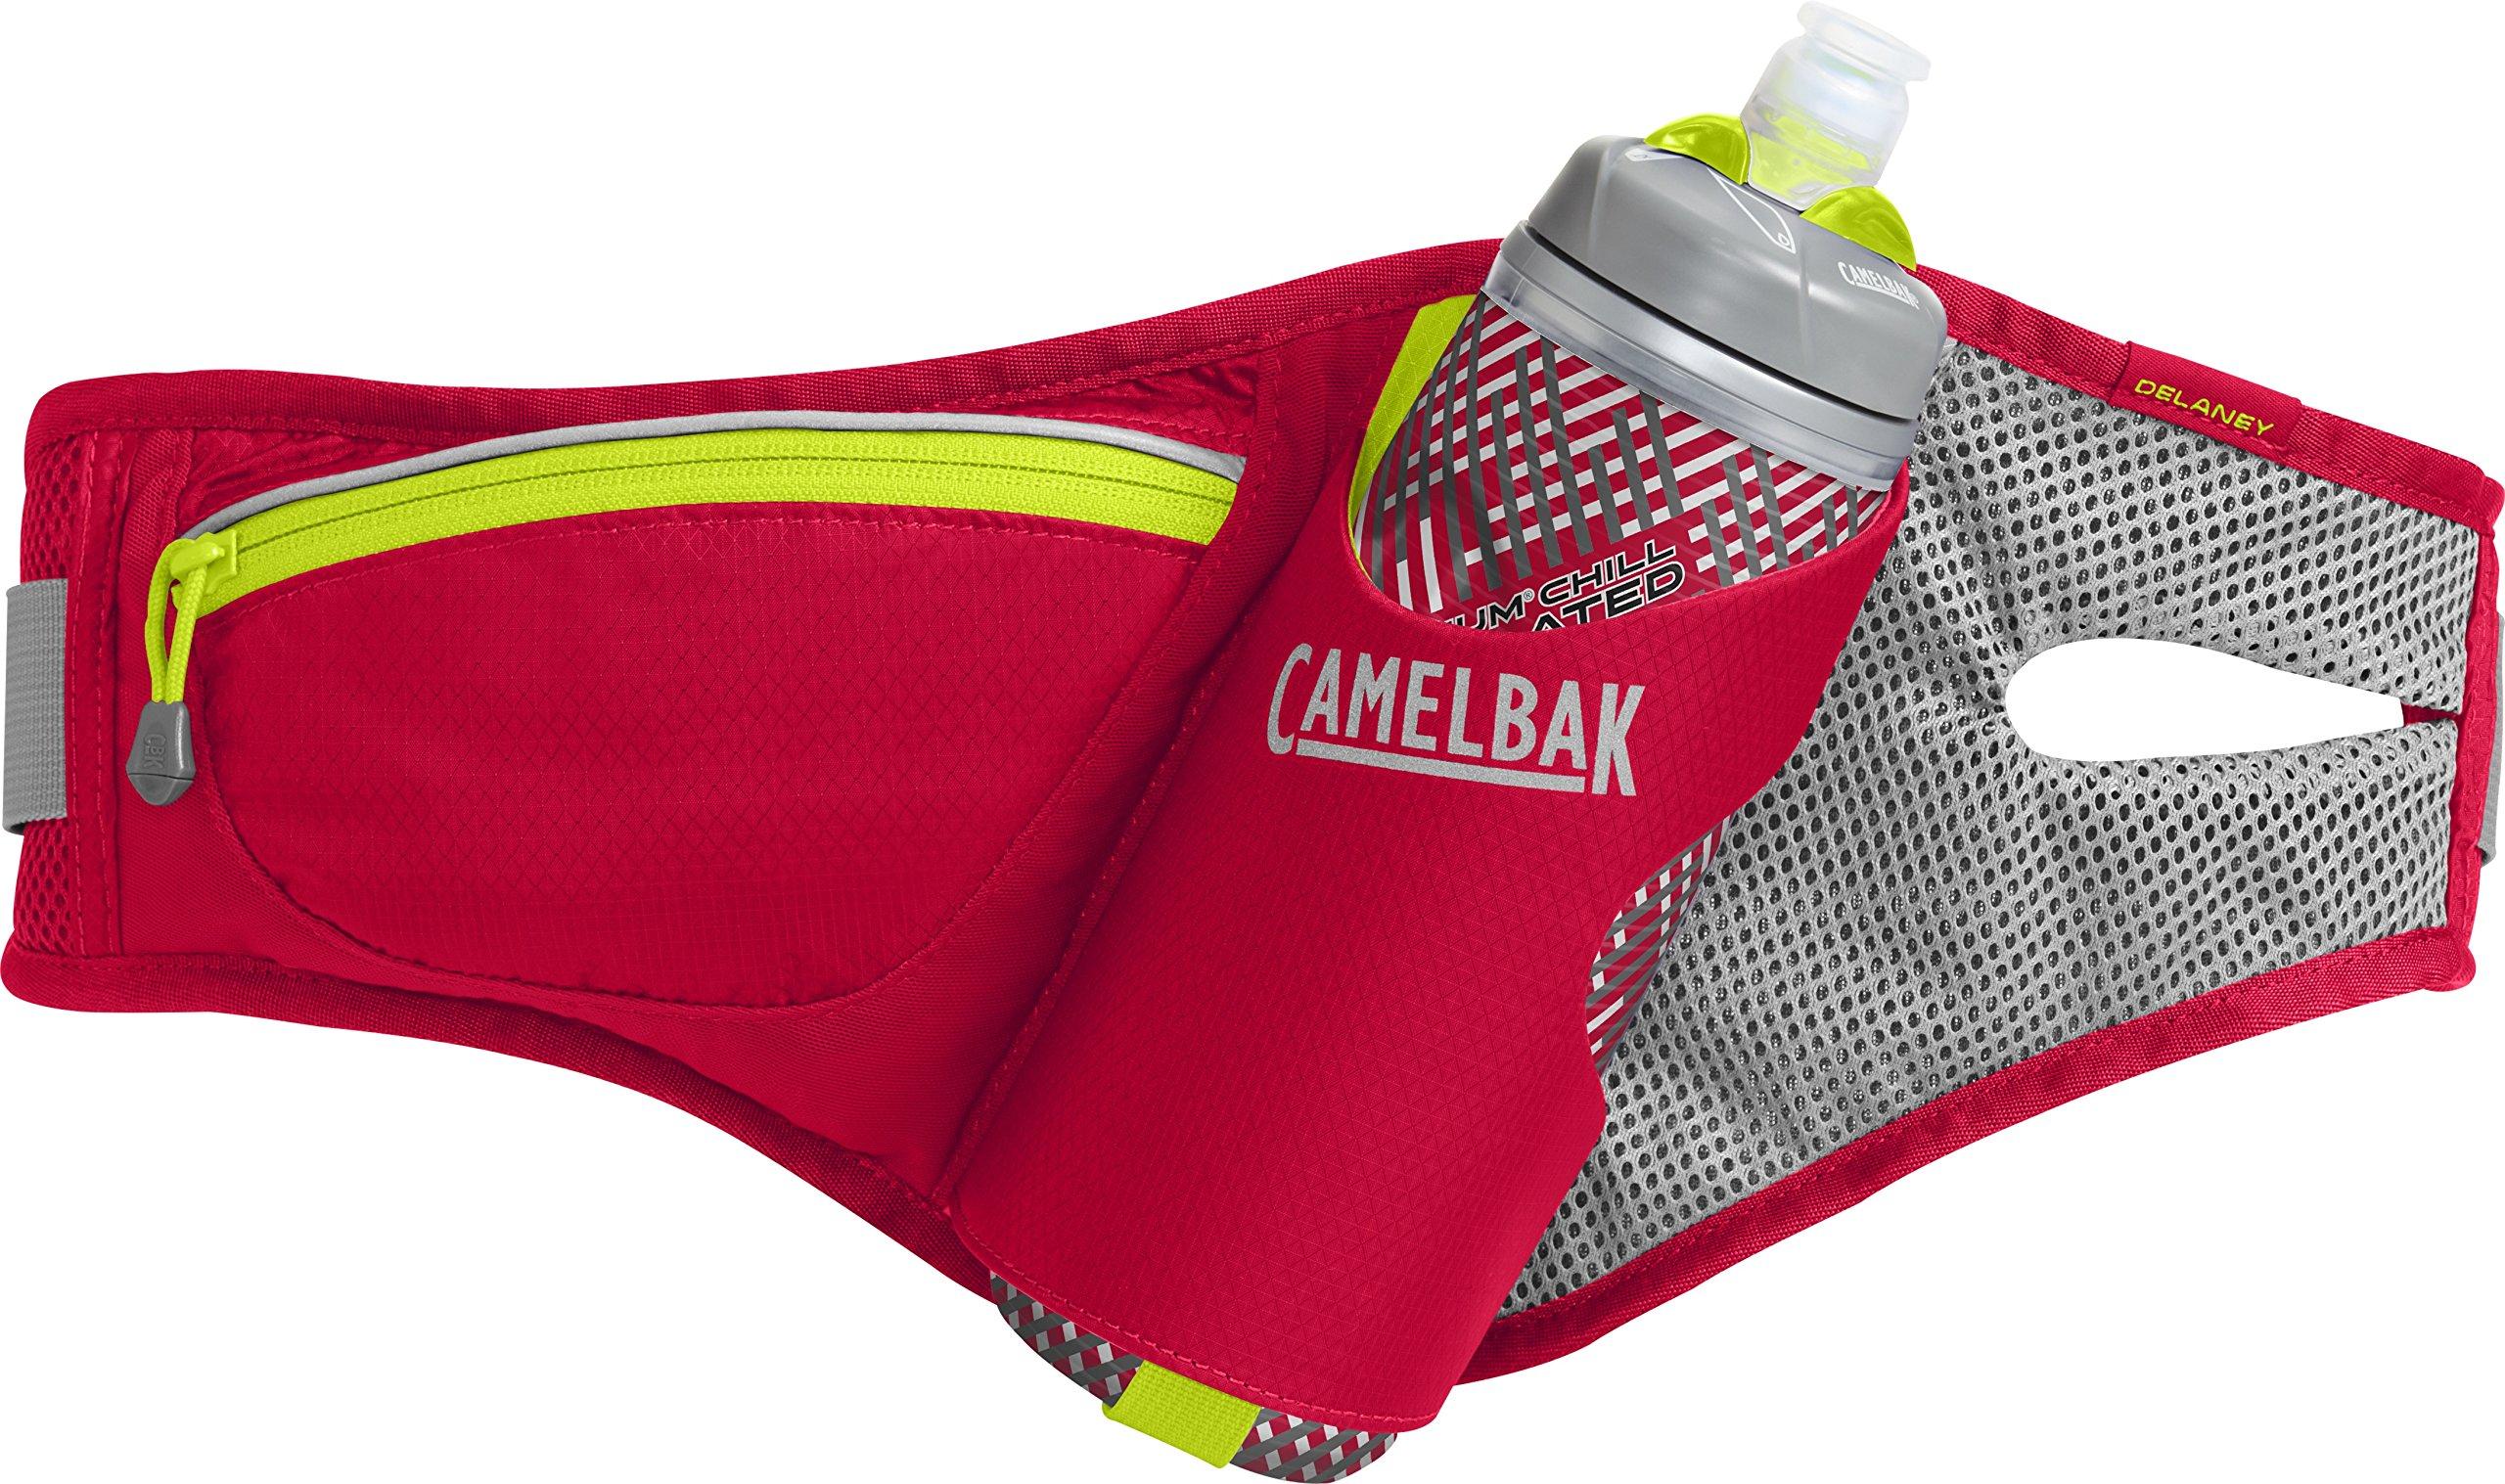 CamelBak Delaney Podium Hydration Crimson